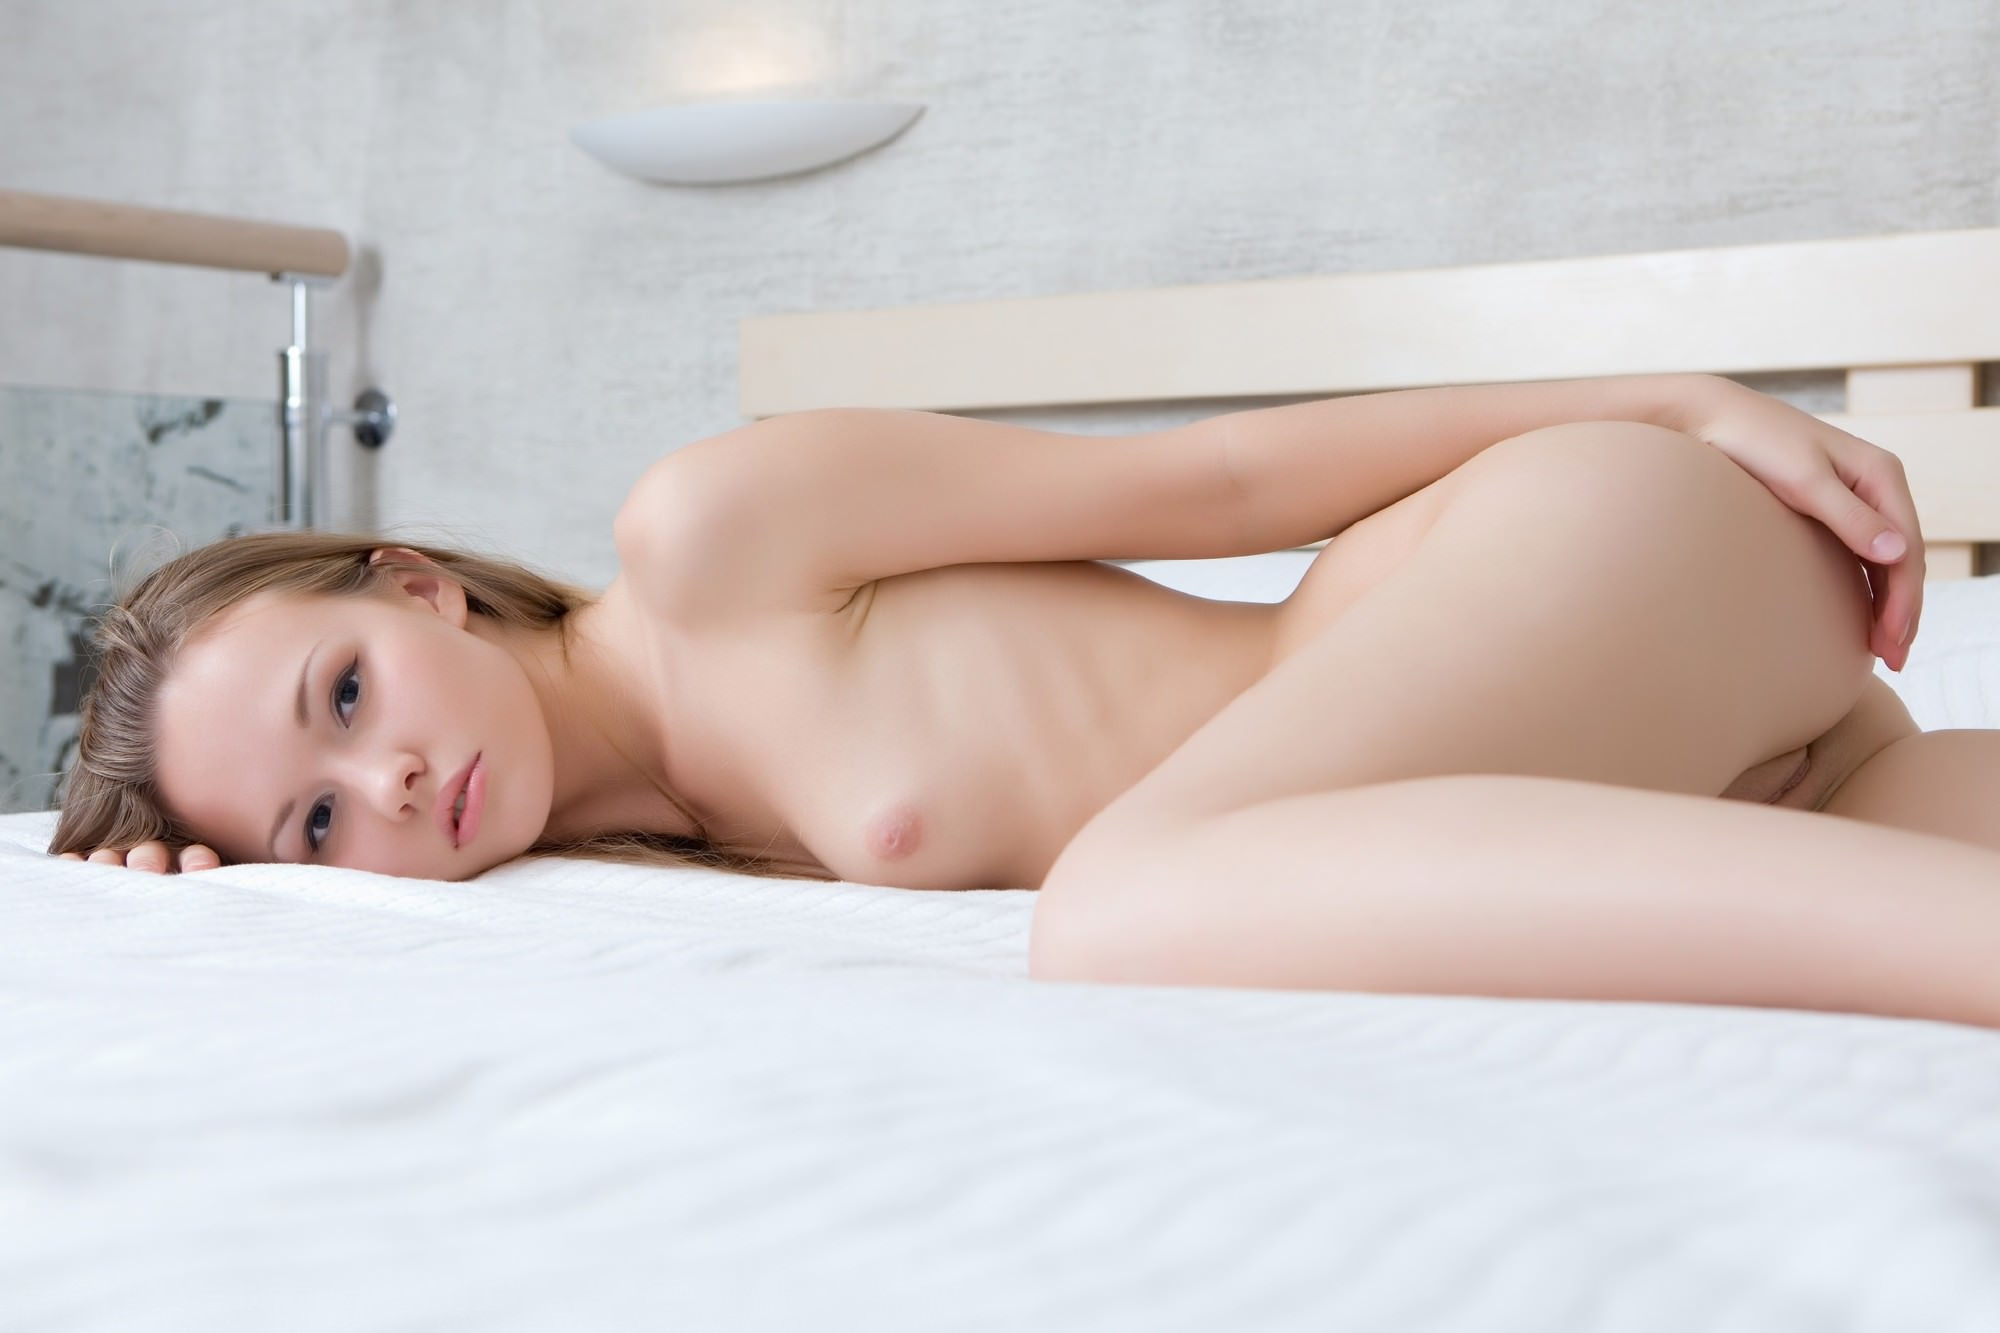 Va tech coeds naked